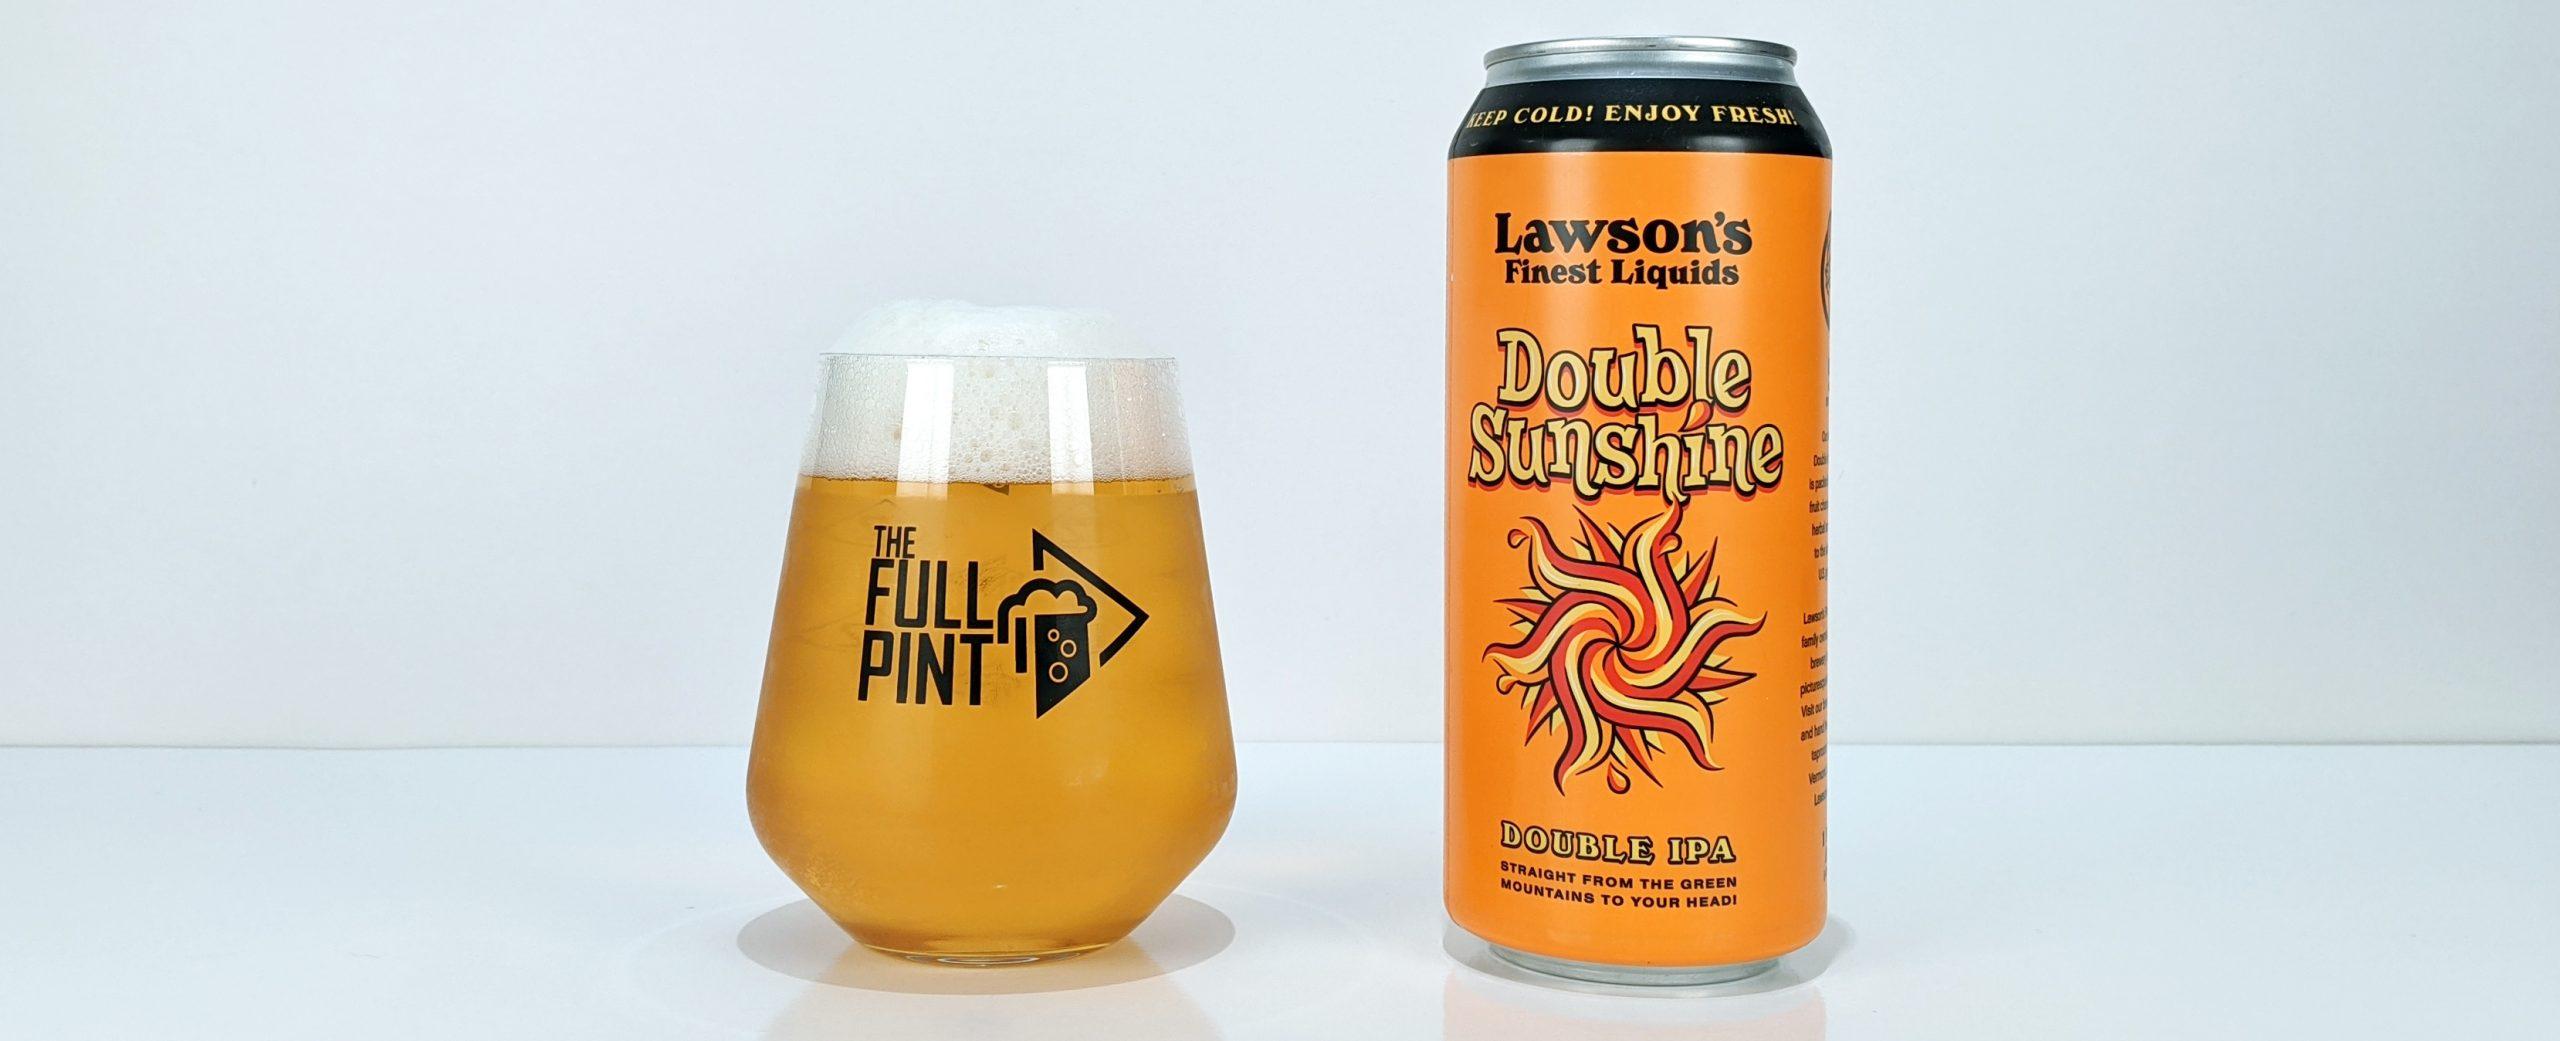 Lawsons Finest Liquids Double Sunshine IPA